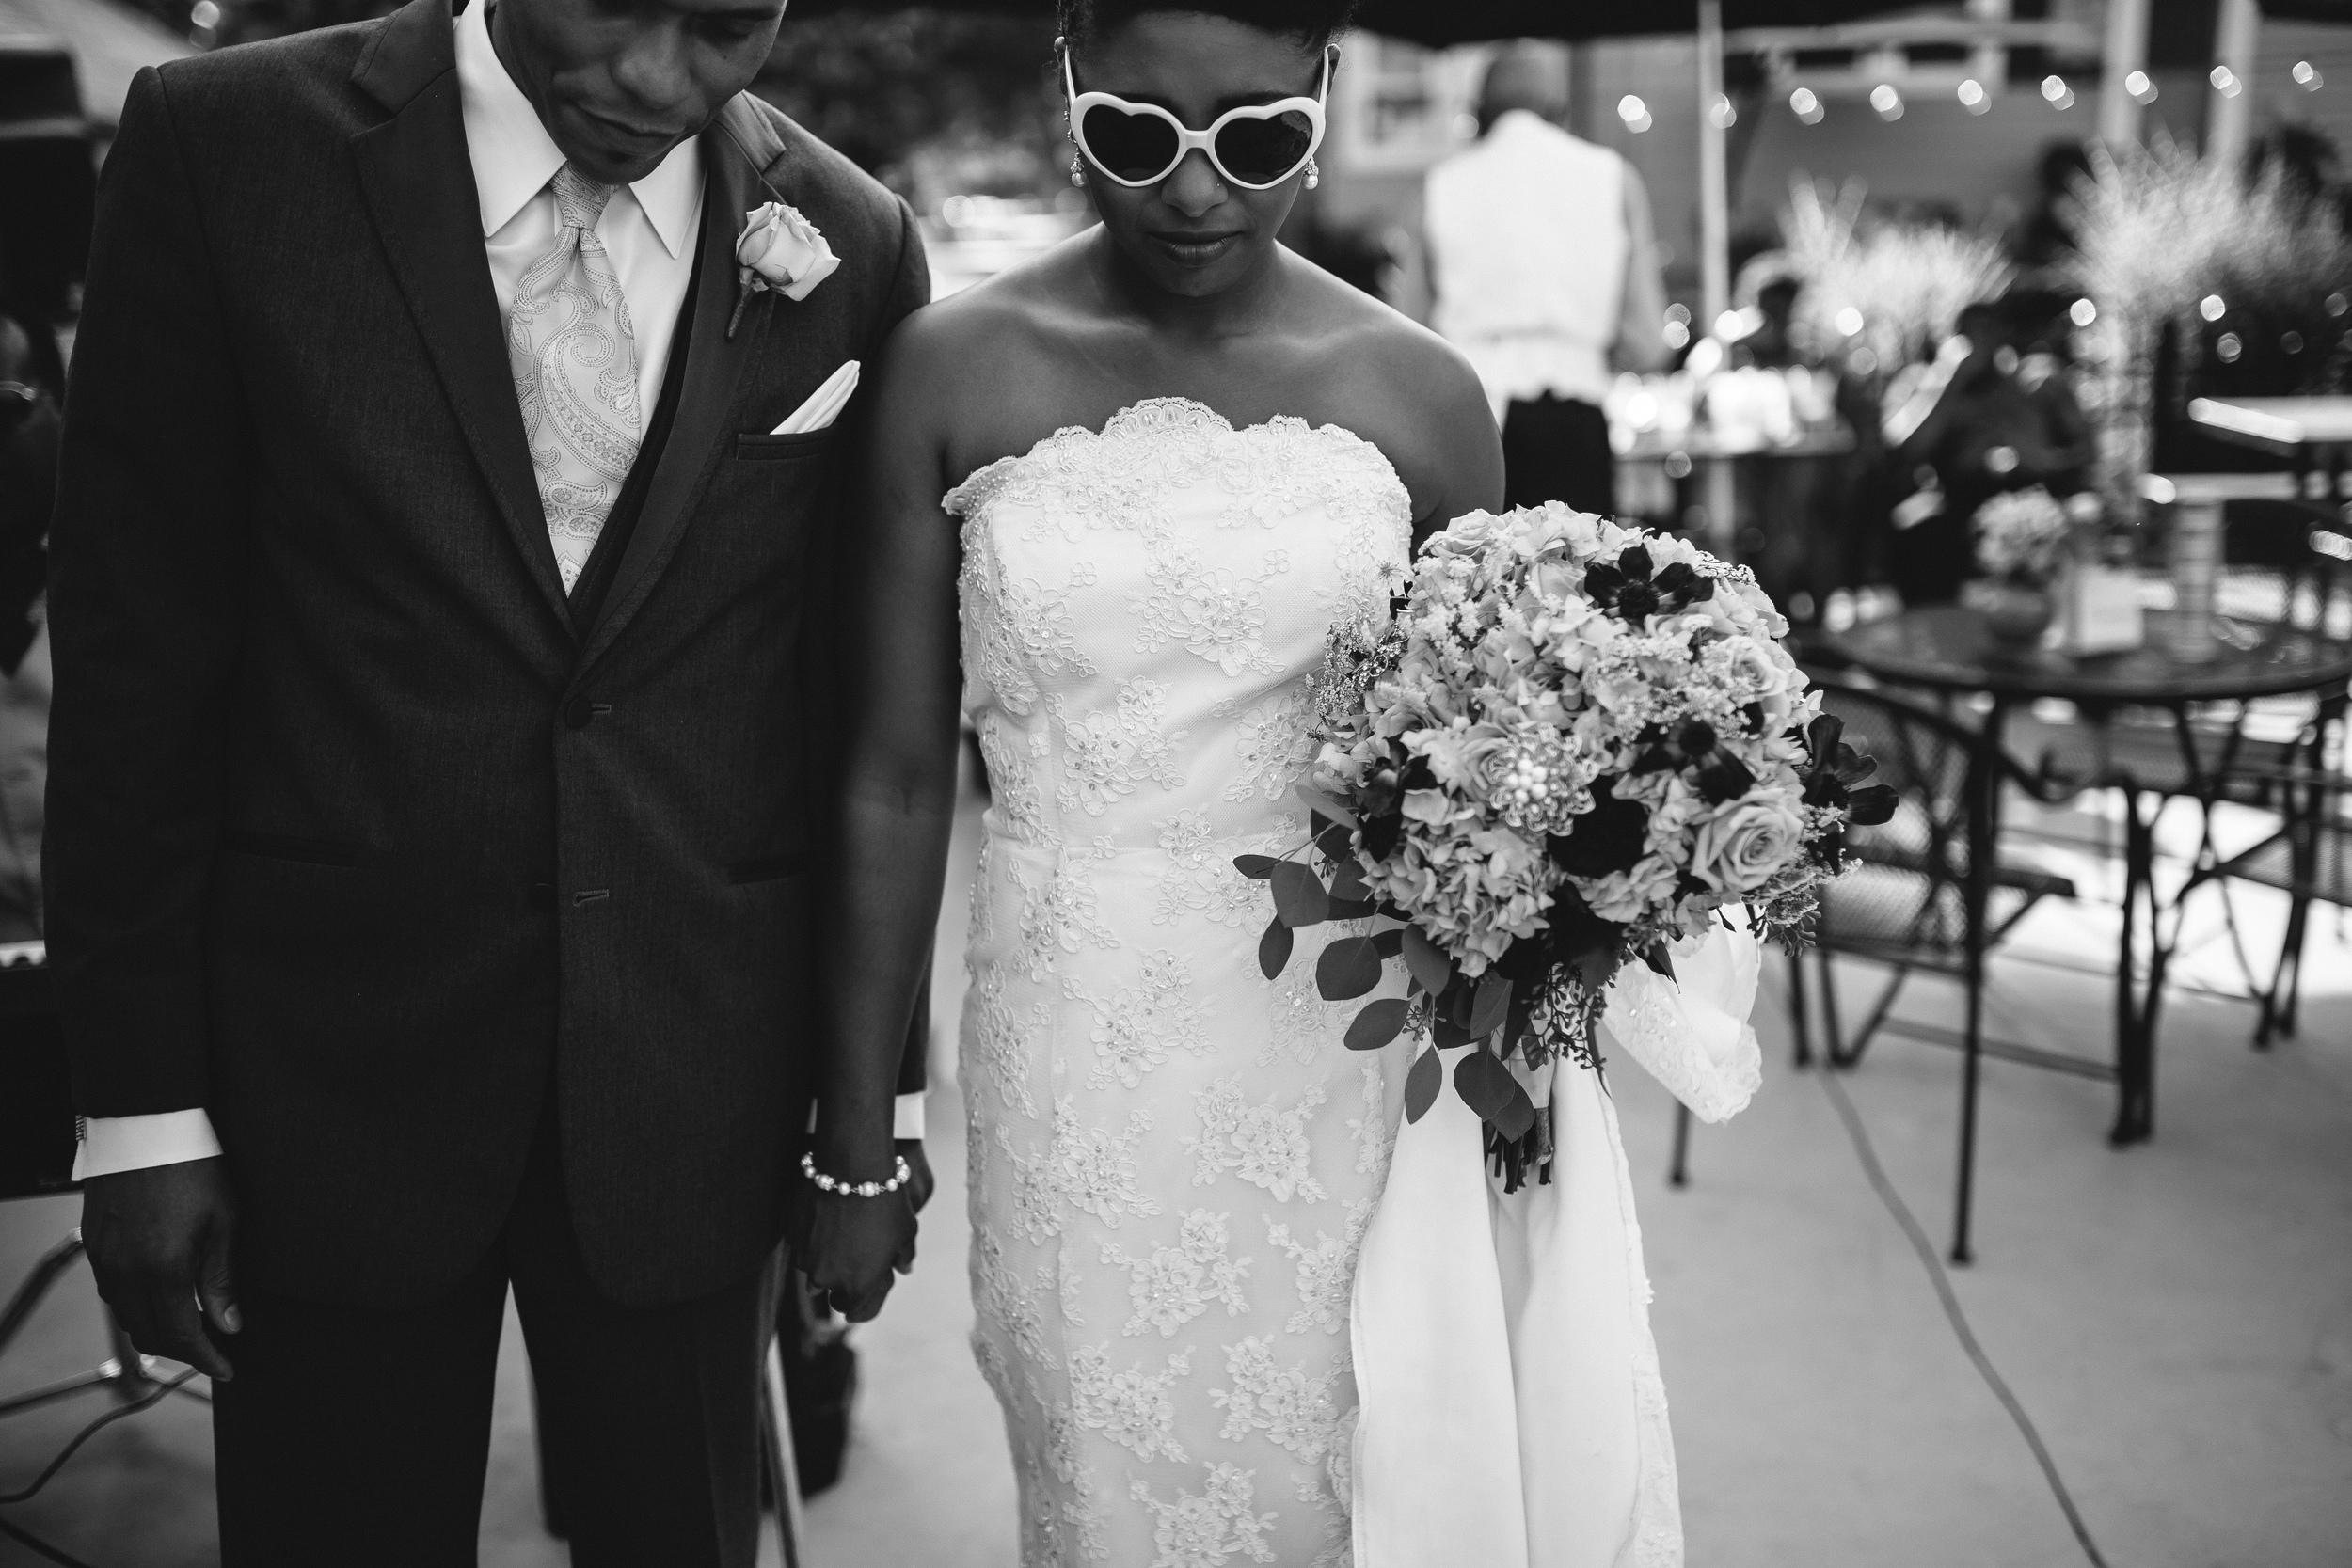 Chuck & Alicia's Wedding - Corrie Mick Photography-509.jpg